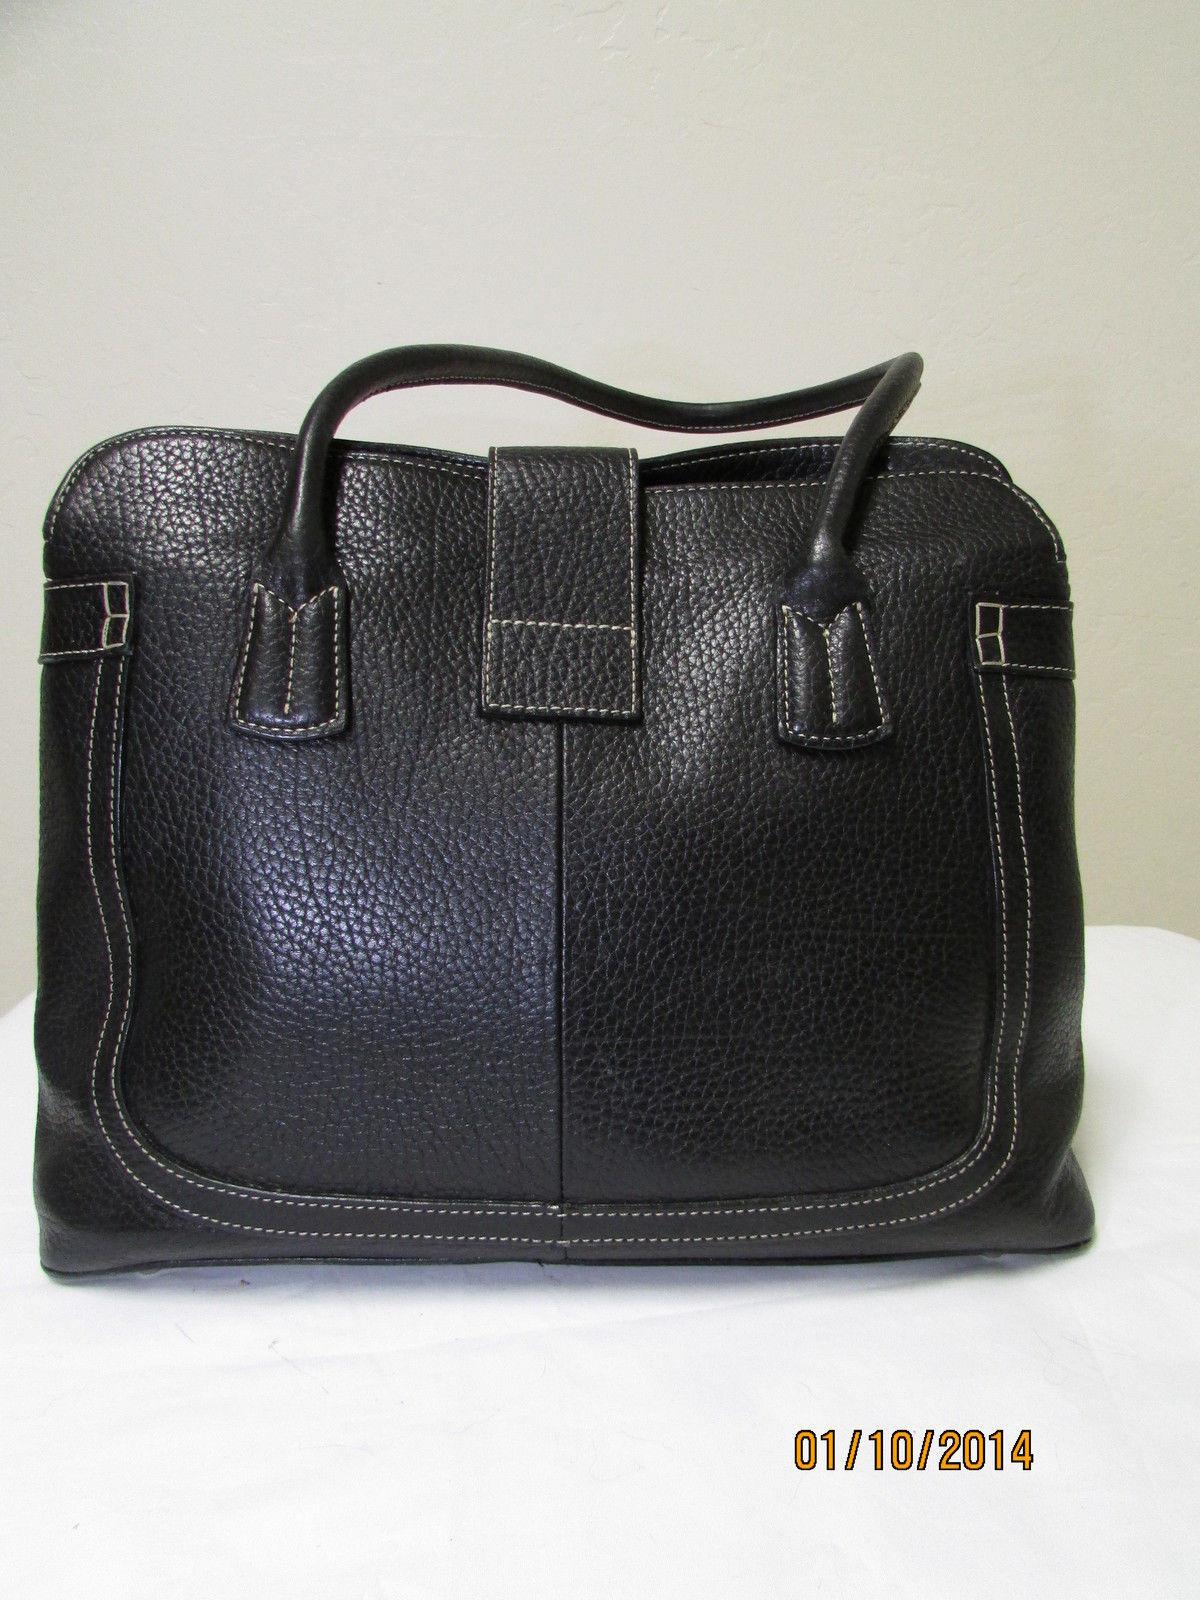 Exceptional Mila Paoli Genuine Black Pebble Leather Shoulder Bag image 5